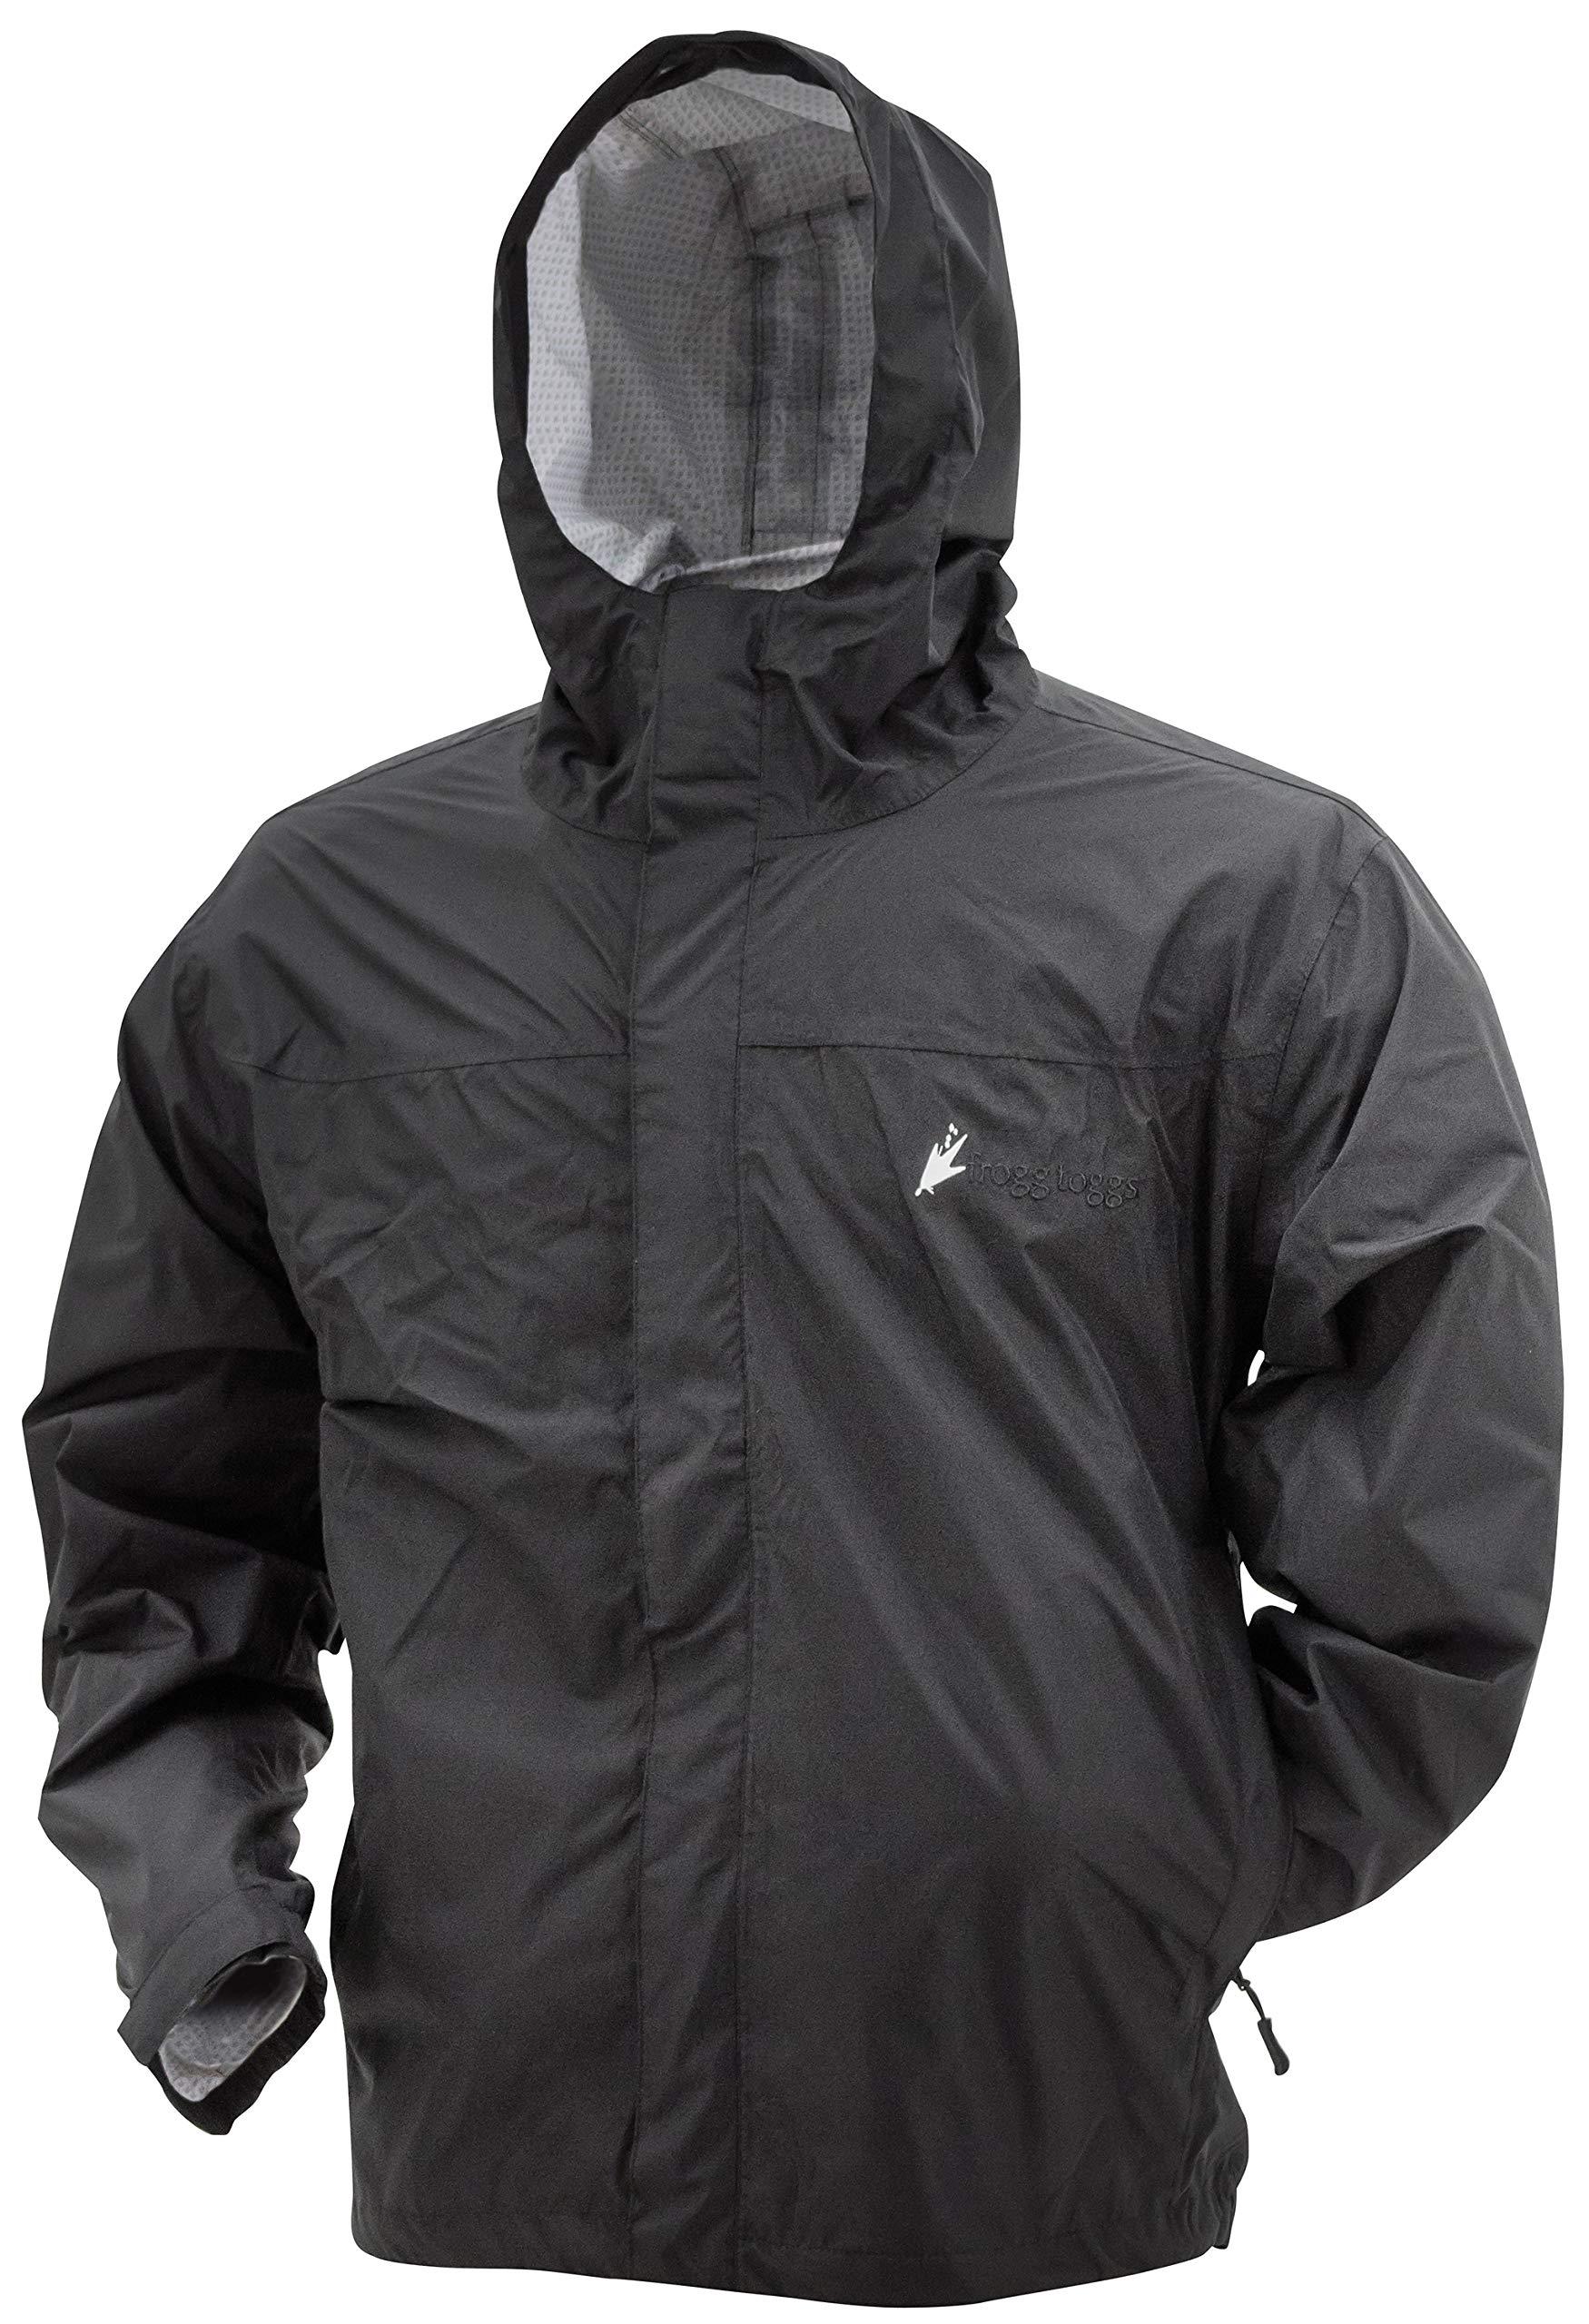 Frogg Toggs Java 2.5 Jacket, Youth, Black, Size Large